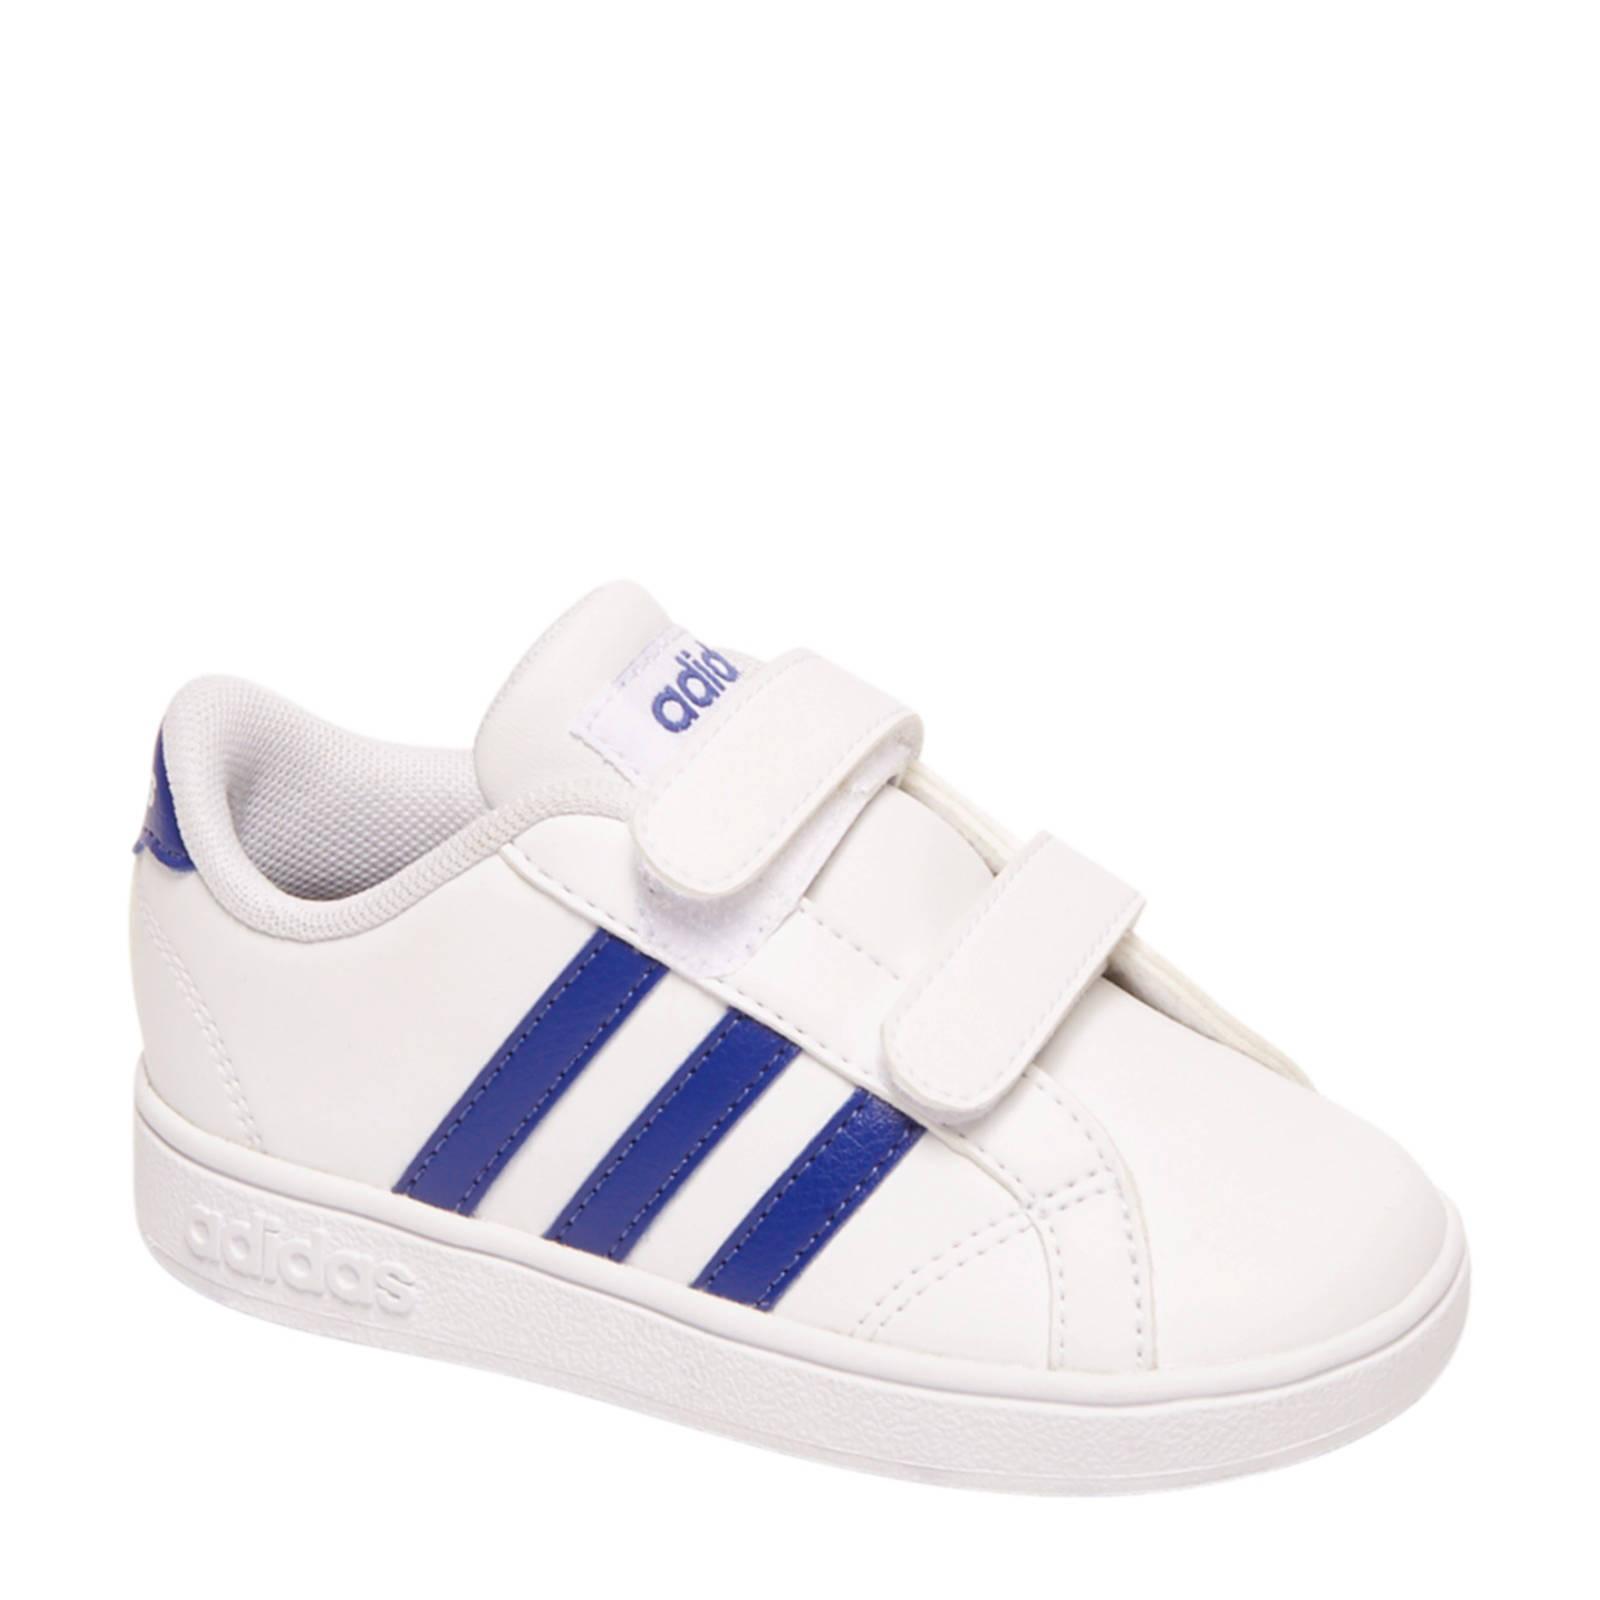 e58108f9c5b National Glamour Day schoenen bij wehkamp - Gratis bezorging vanaf 20.-